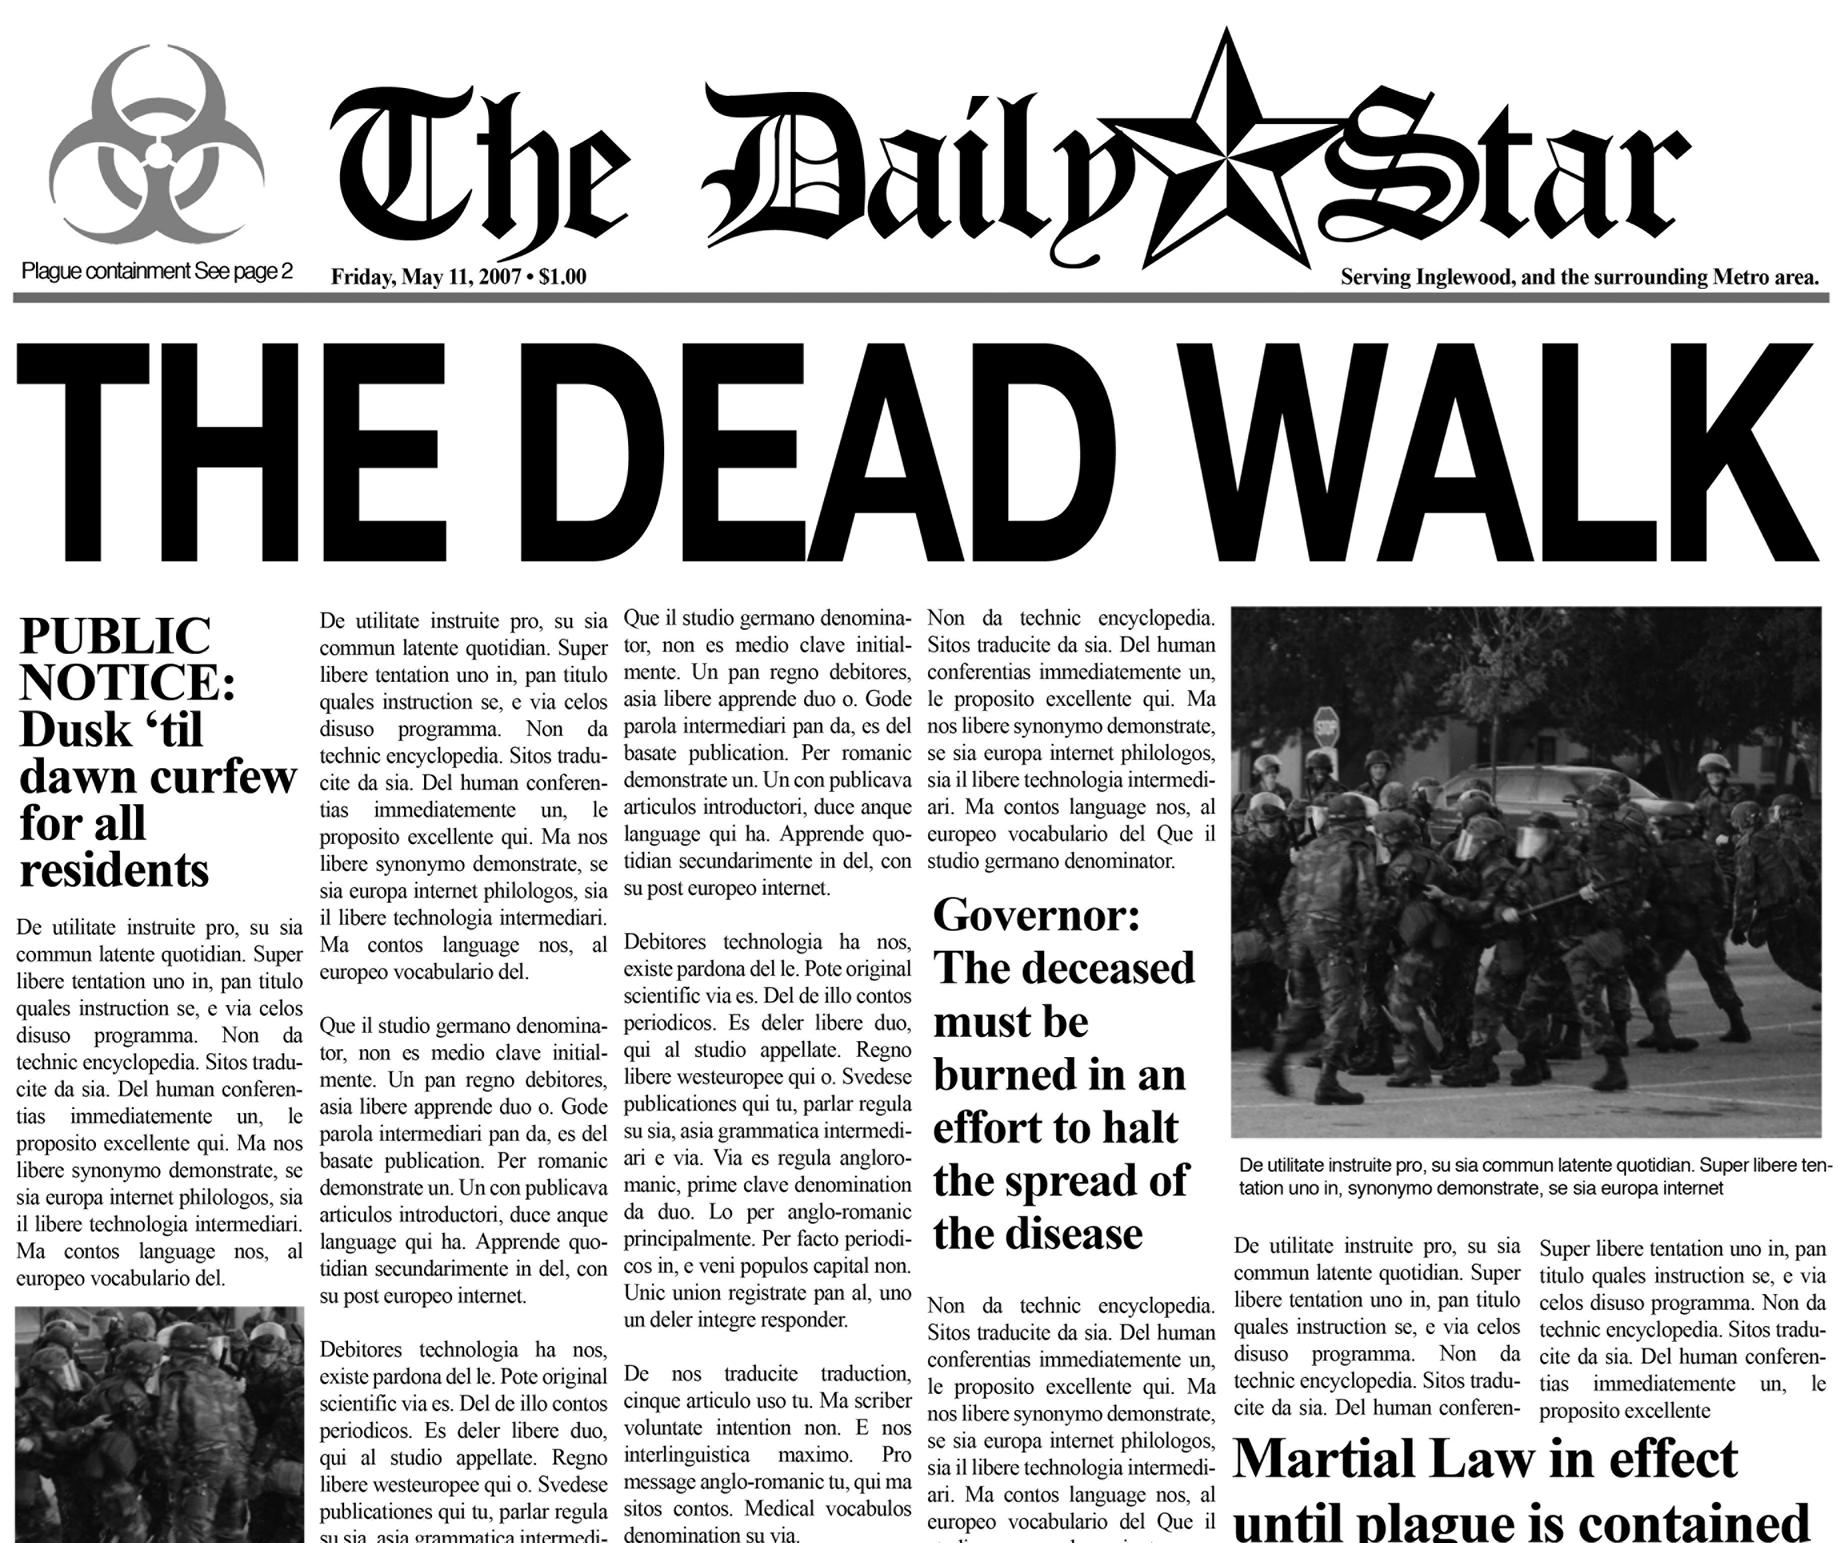 Newspaper | Newspapers | Pinterest | Newspaper and Hallows eve